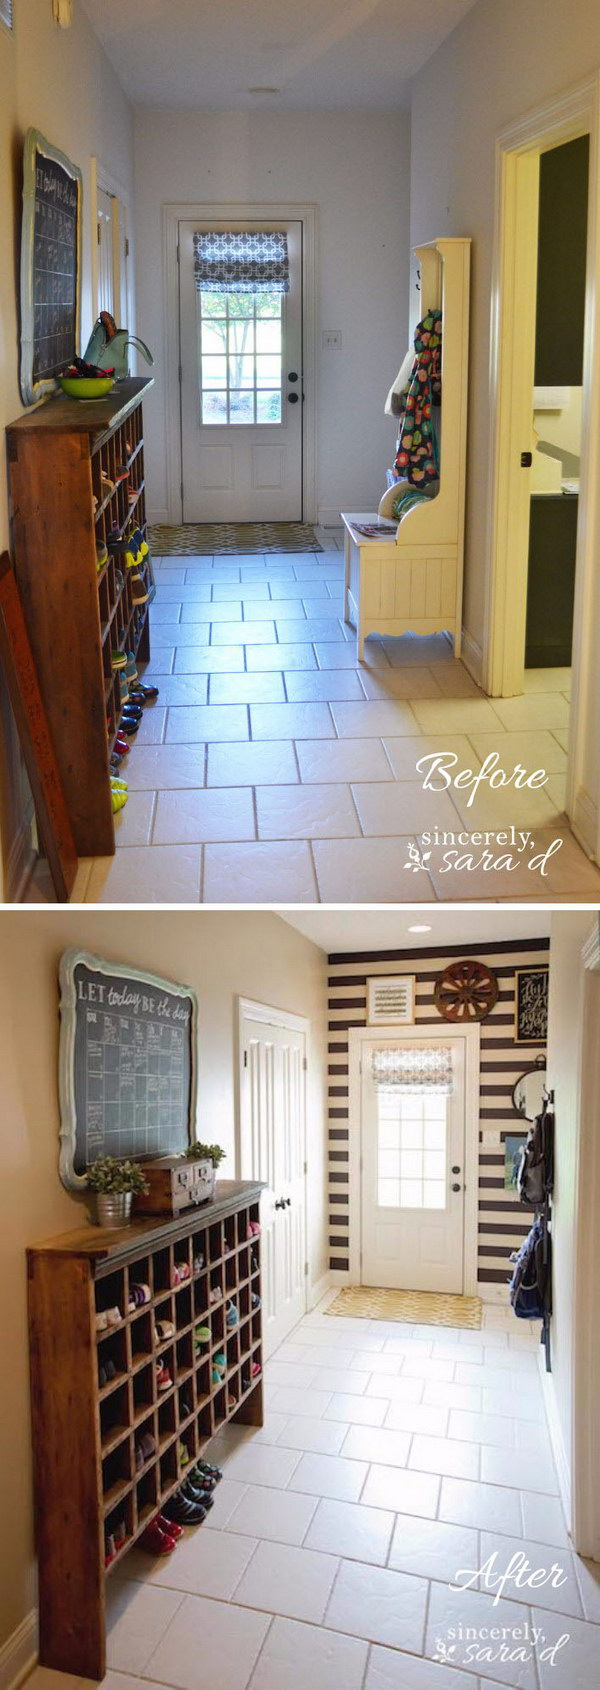 10 entryway makeover diy ideas tutorials - 30+ DIY Ideas to Give a Makeover to a Your Entryway